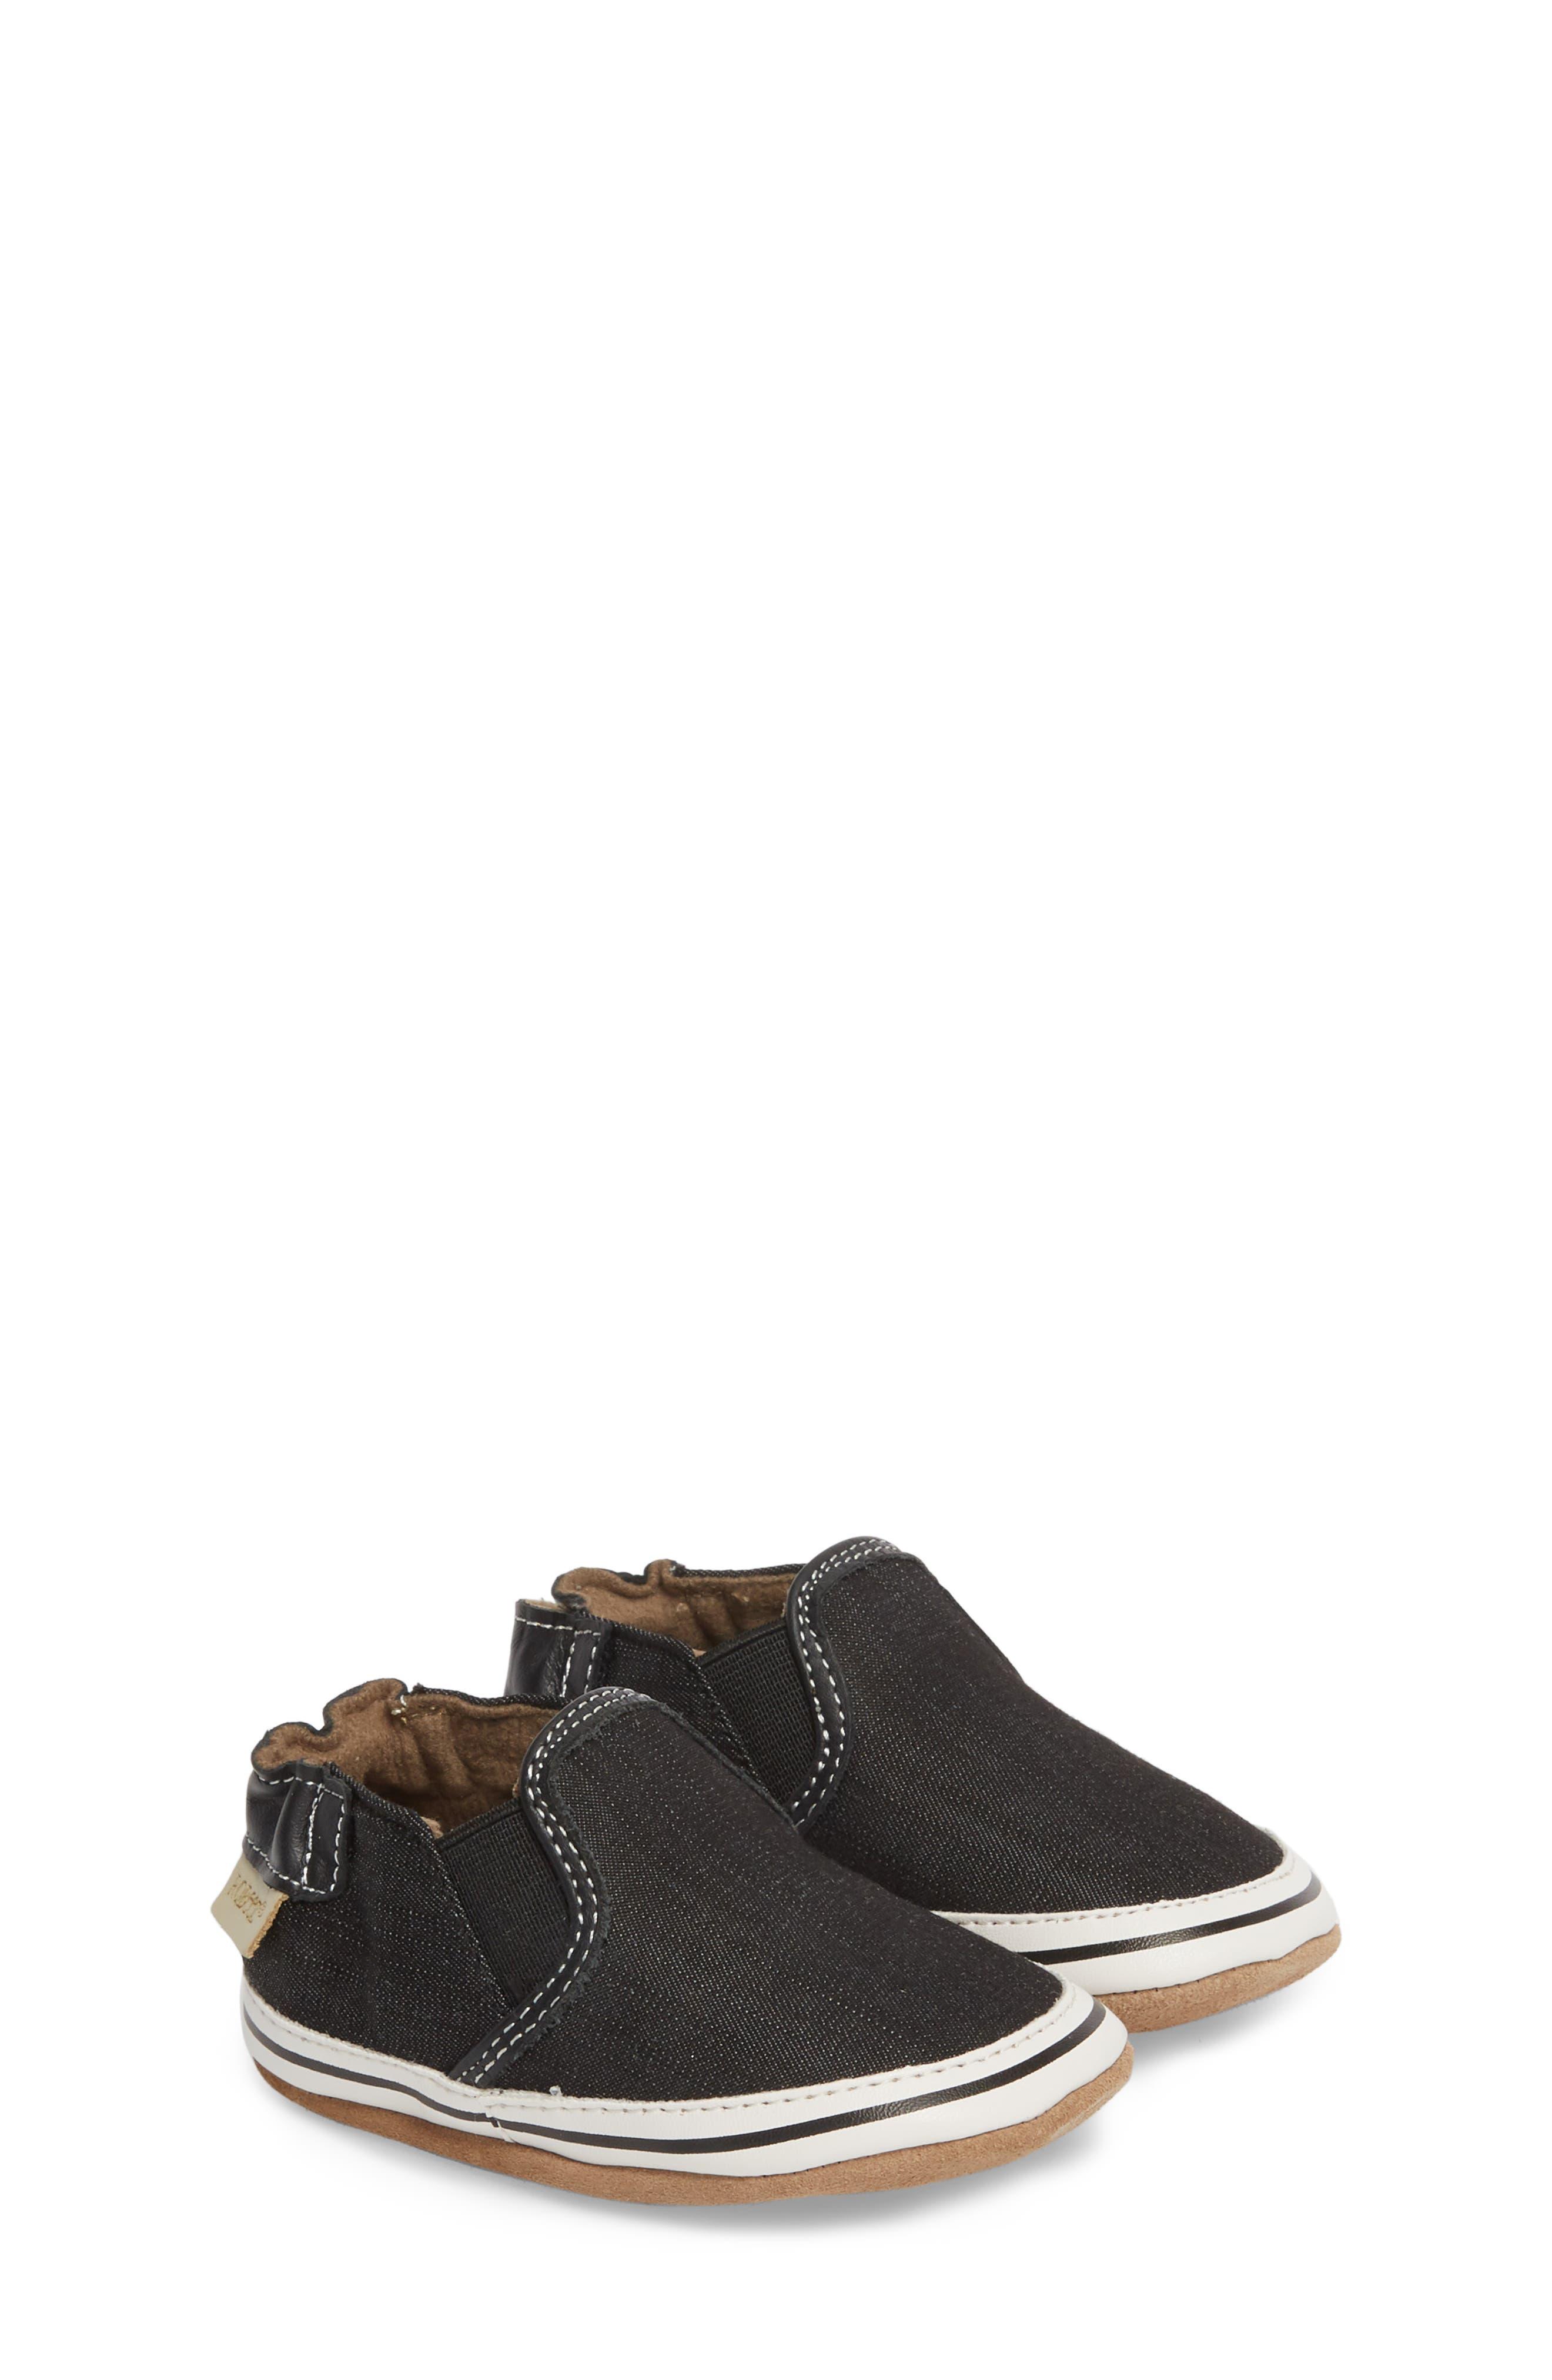 Liam Slip-On Crib Sneaker,                         Main,                         color, BLACK